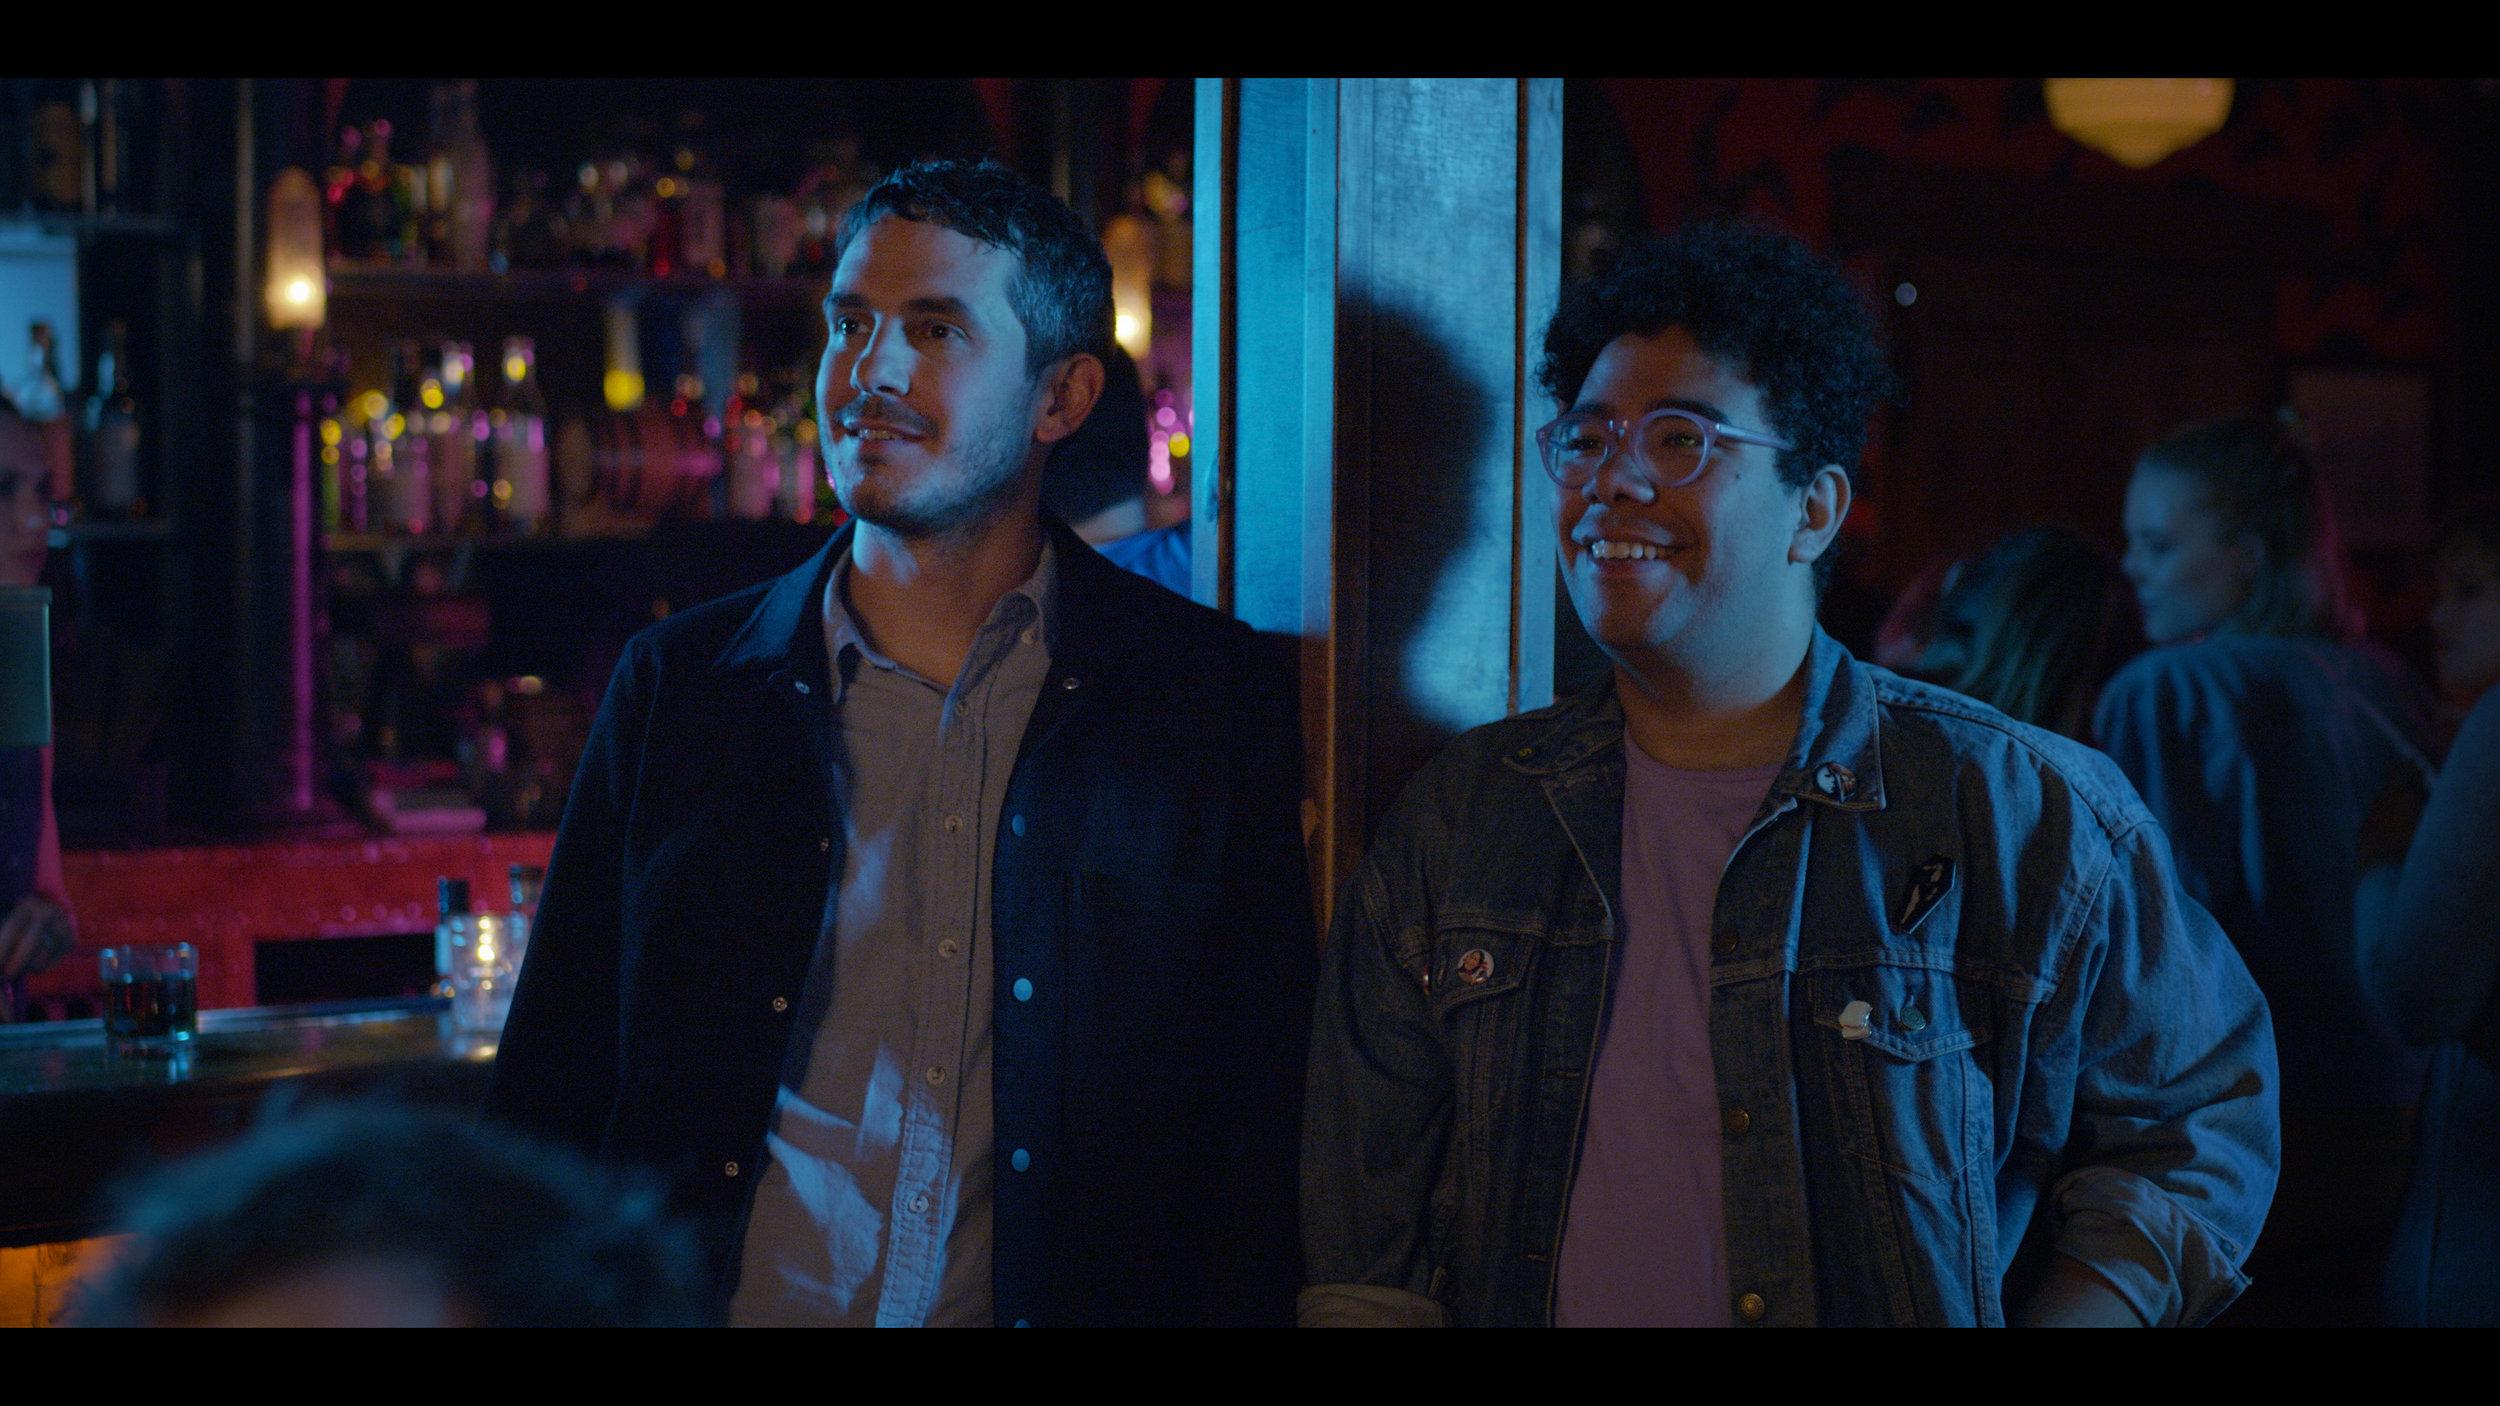 Bill (Tate Ellington) and Manny (Oscar Montoya) watch Jackie Tohn perform